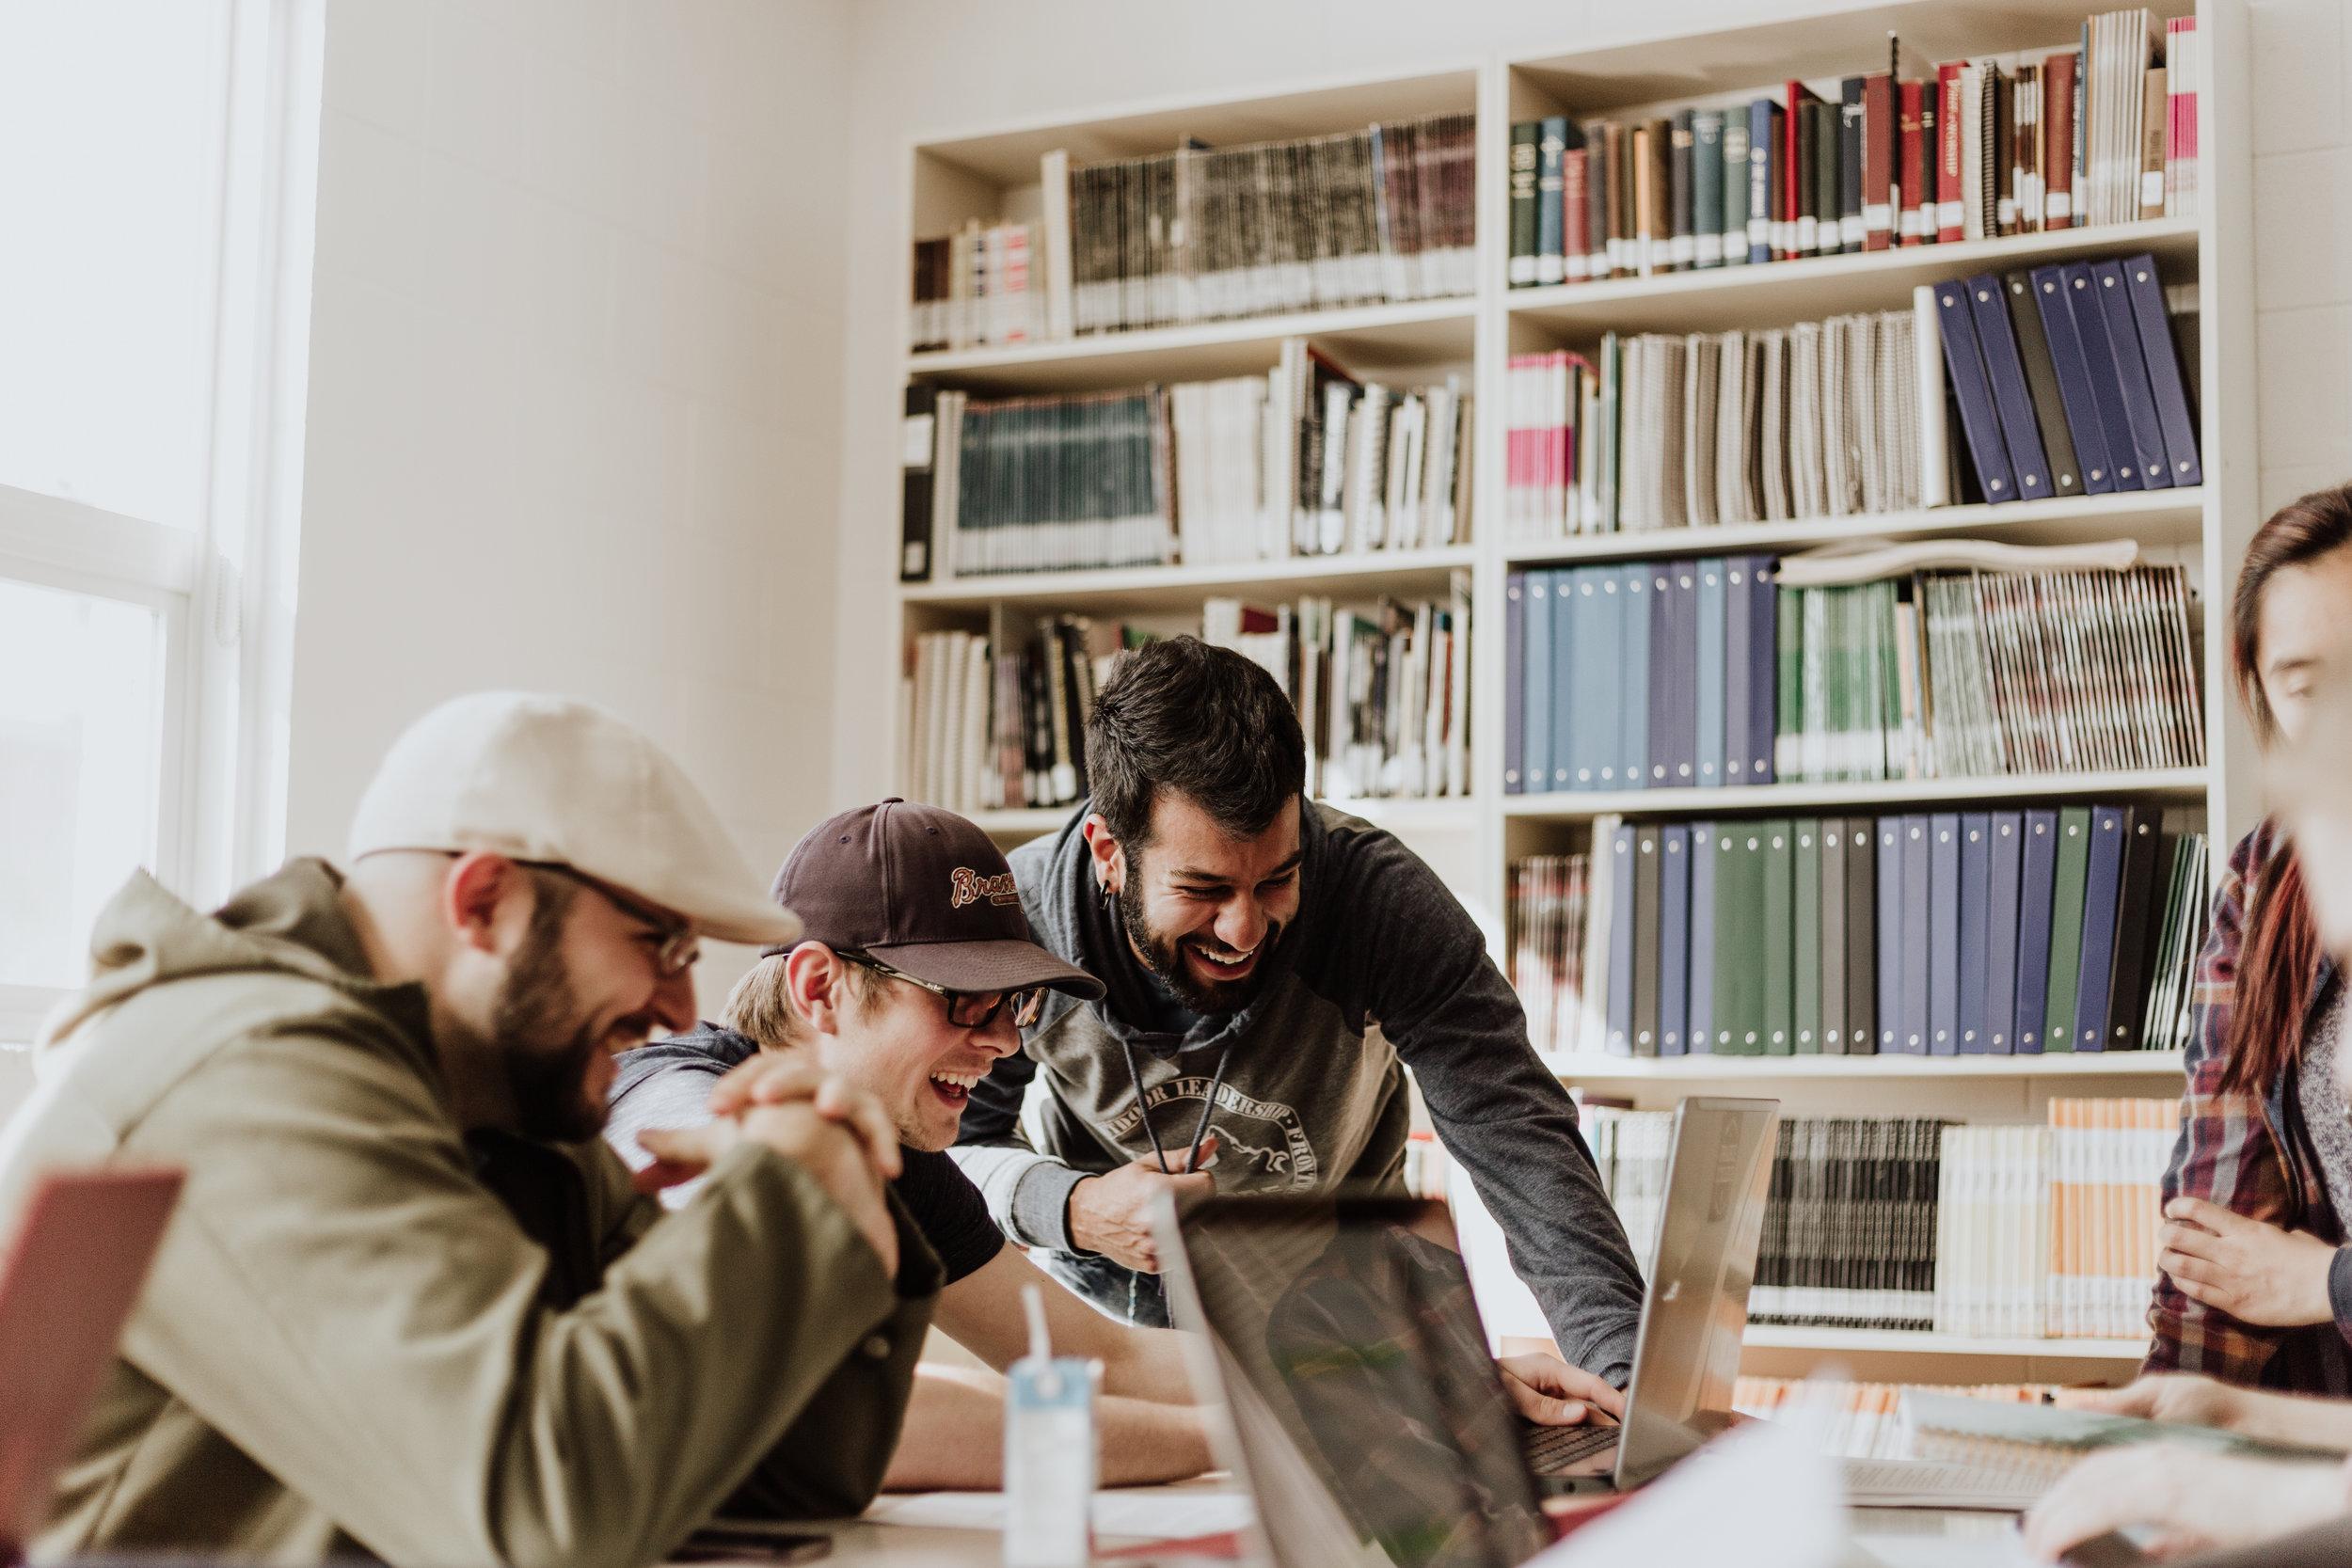 Office365 für Bonn und Umgebung - Konfiguration, Schulung & Beratung